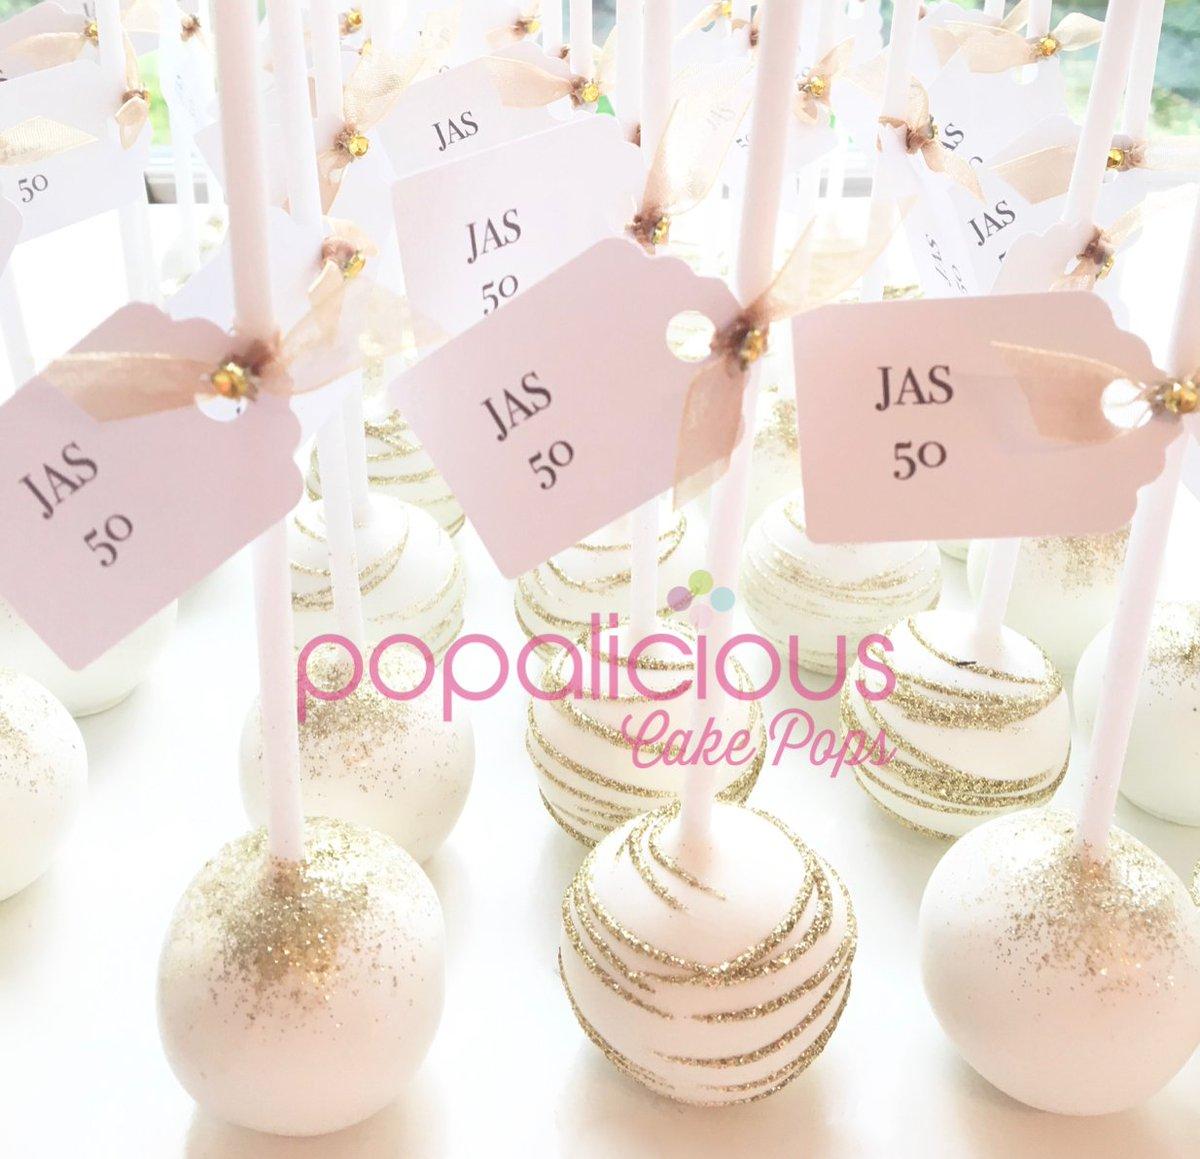 Superb Popalicious Cake Pop On Twitter Gorgeous Gold Swirl And Glitter Funny Birthday Cards Online Inifodamsfinfo